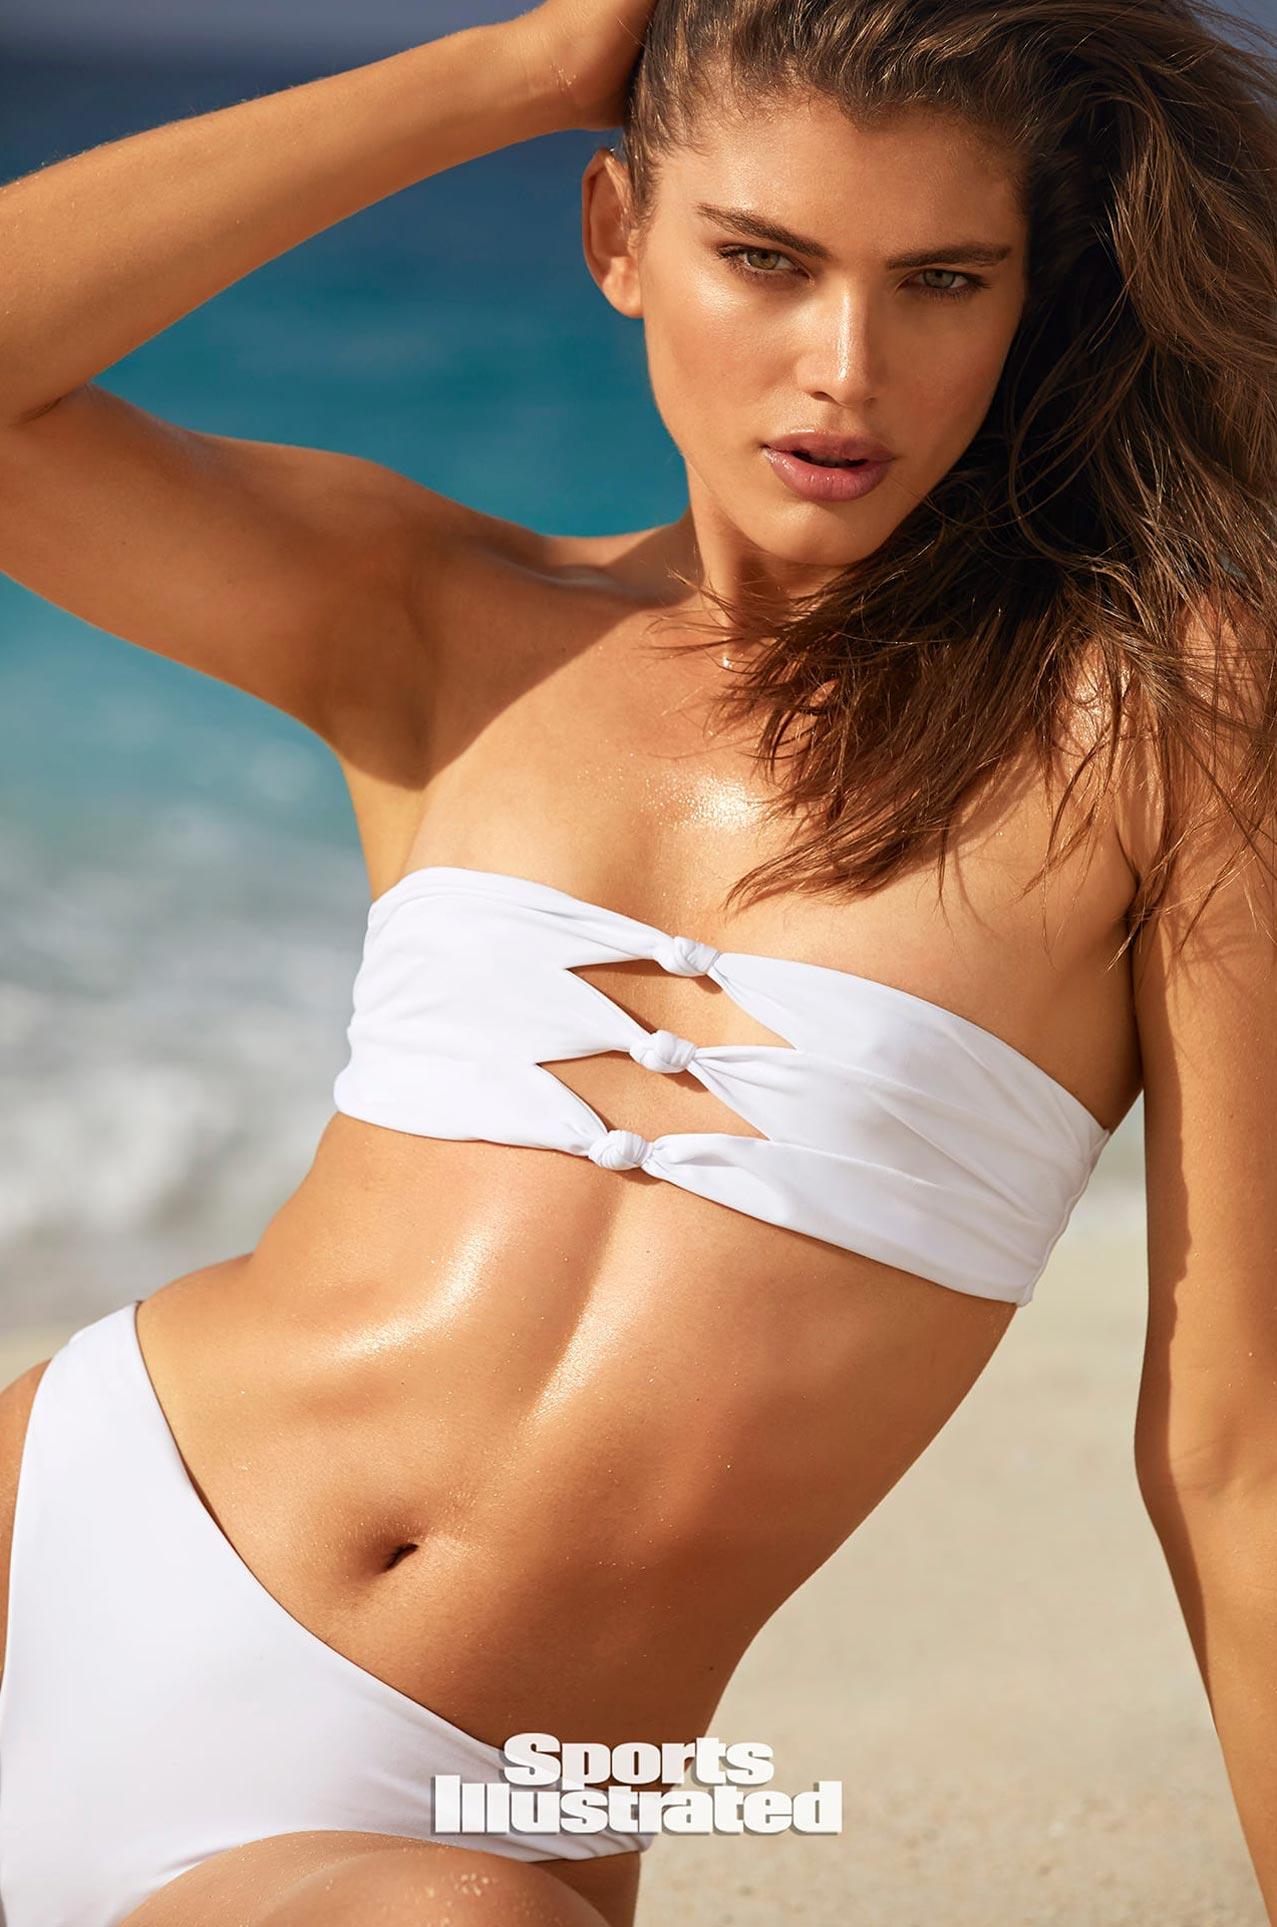 Валентина Сампайо в каталоге купальников Sports Illustrated Swimsuit 2020 / фото 17